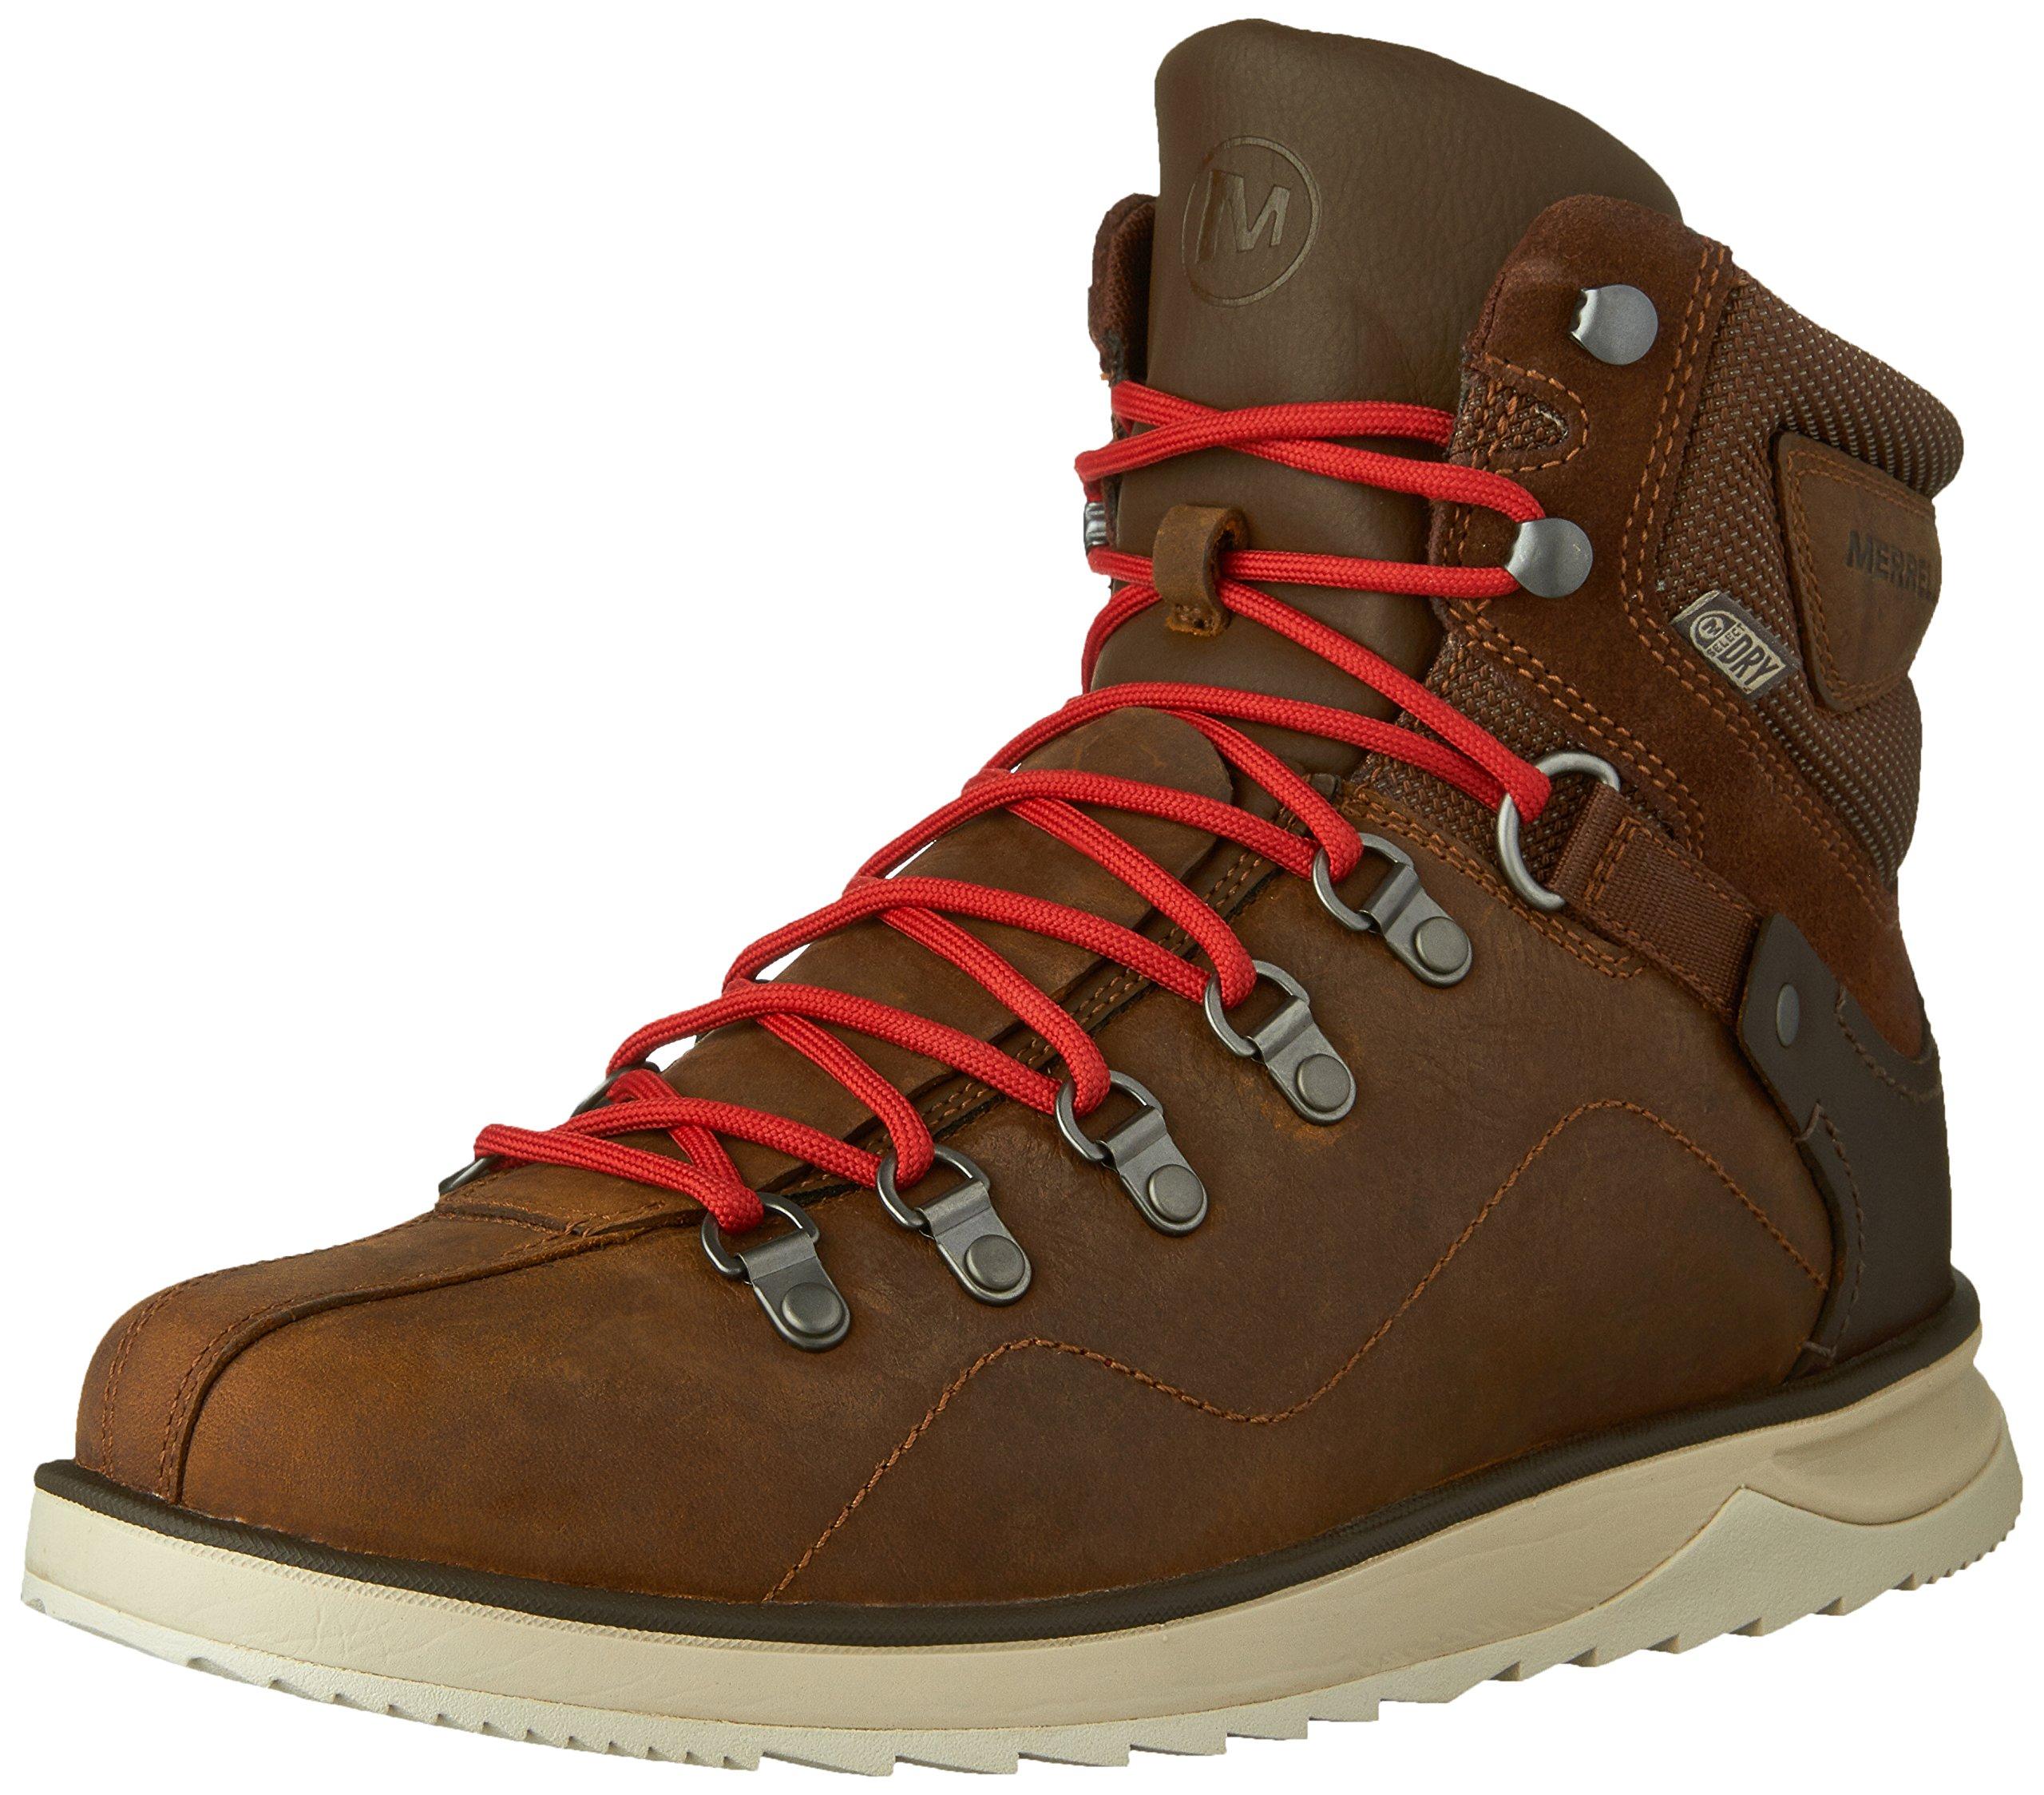 Merrell Men's Epiction Polar Waterproof Winter Boot, Brown Sugar, 12 M US